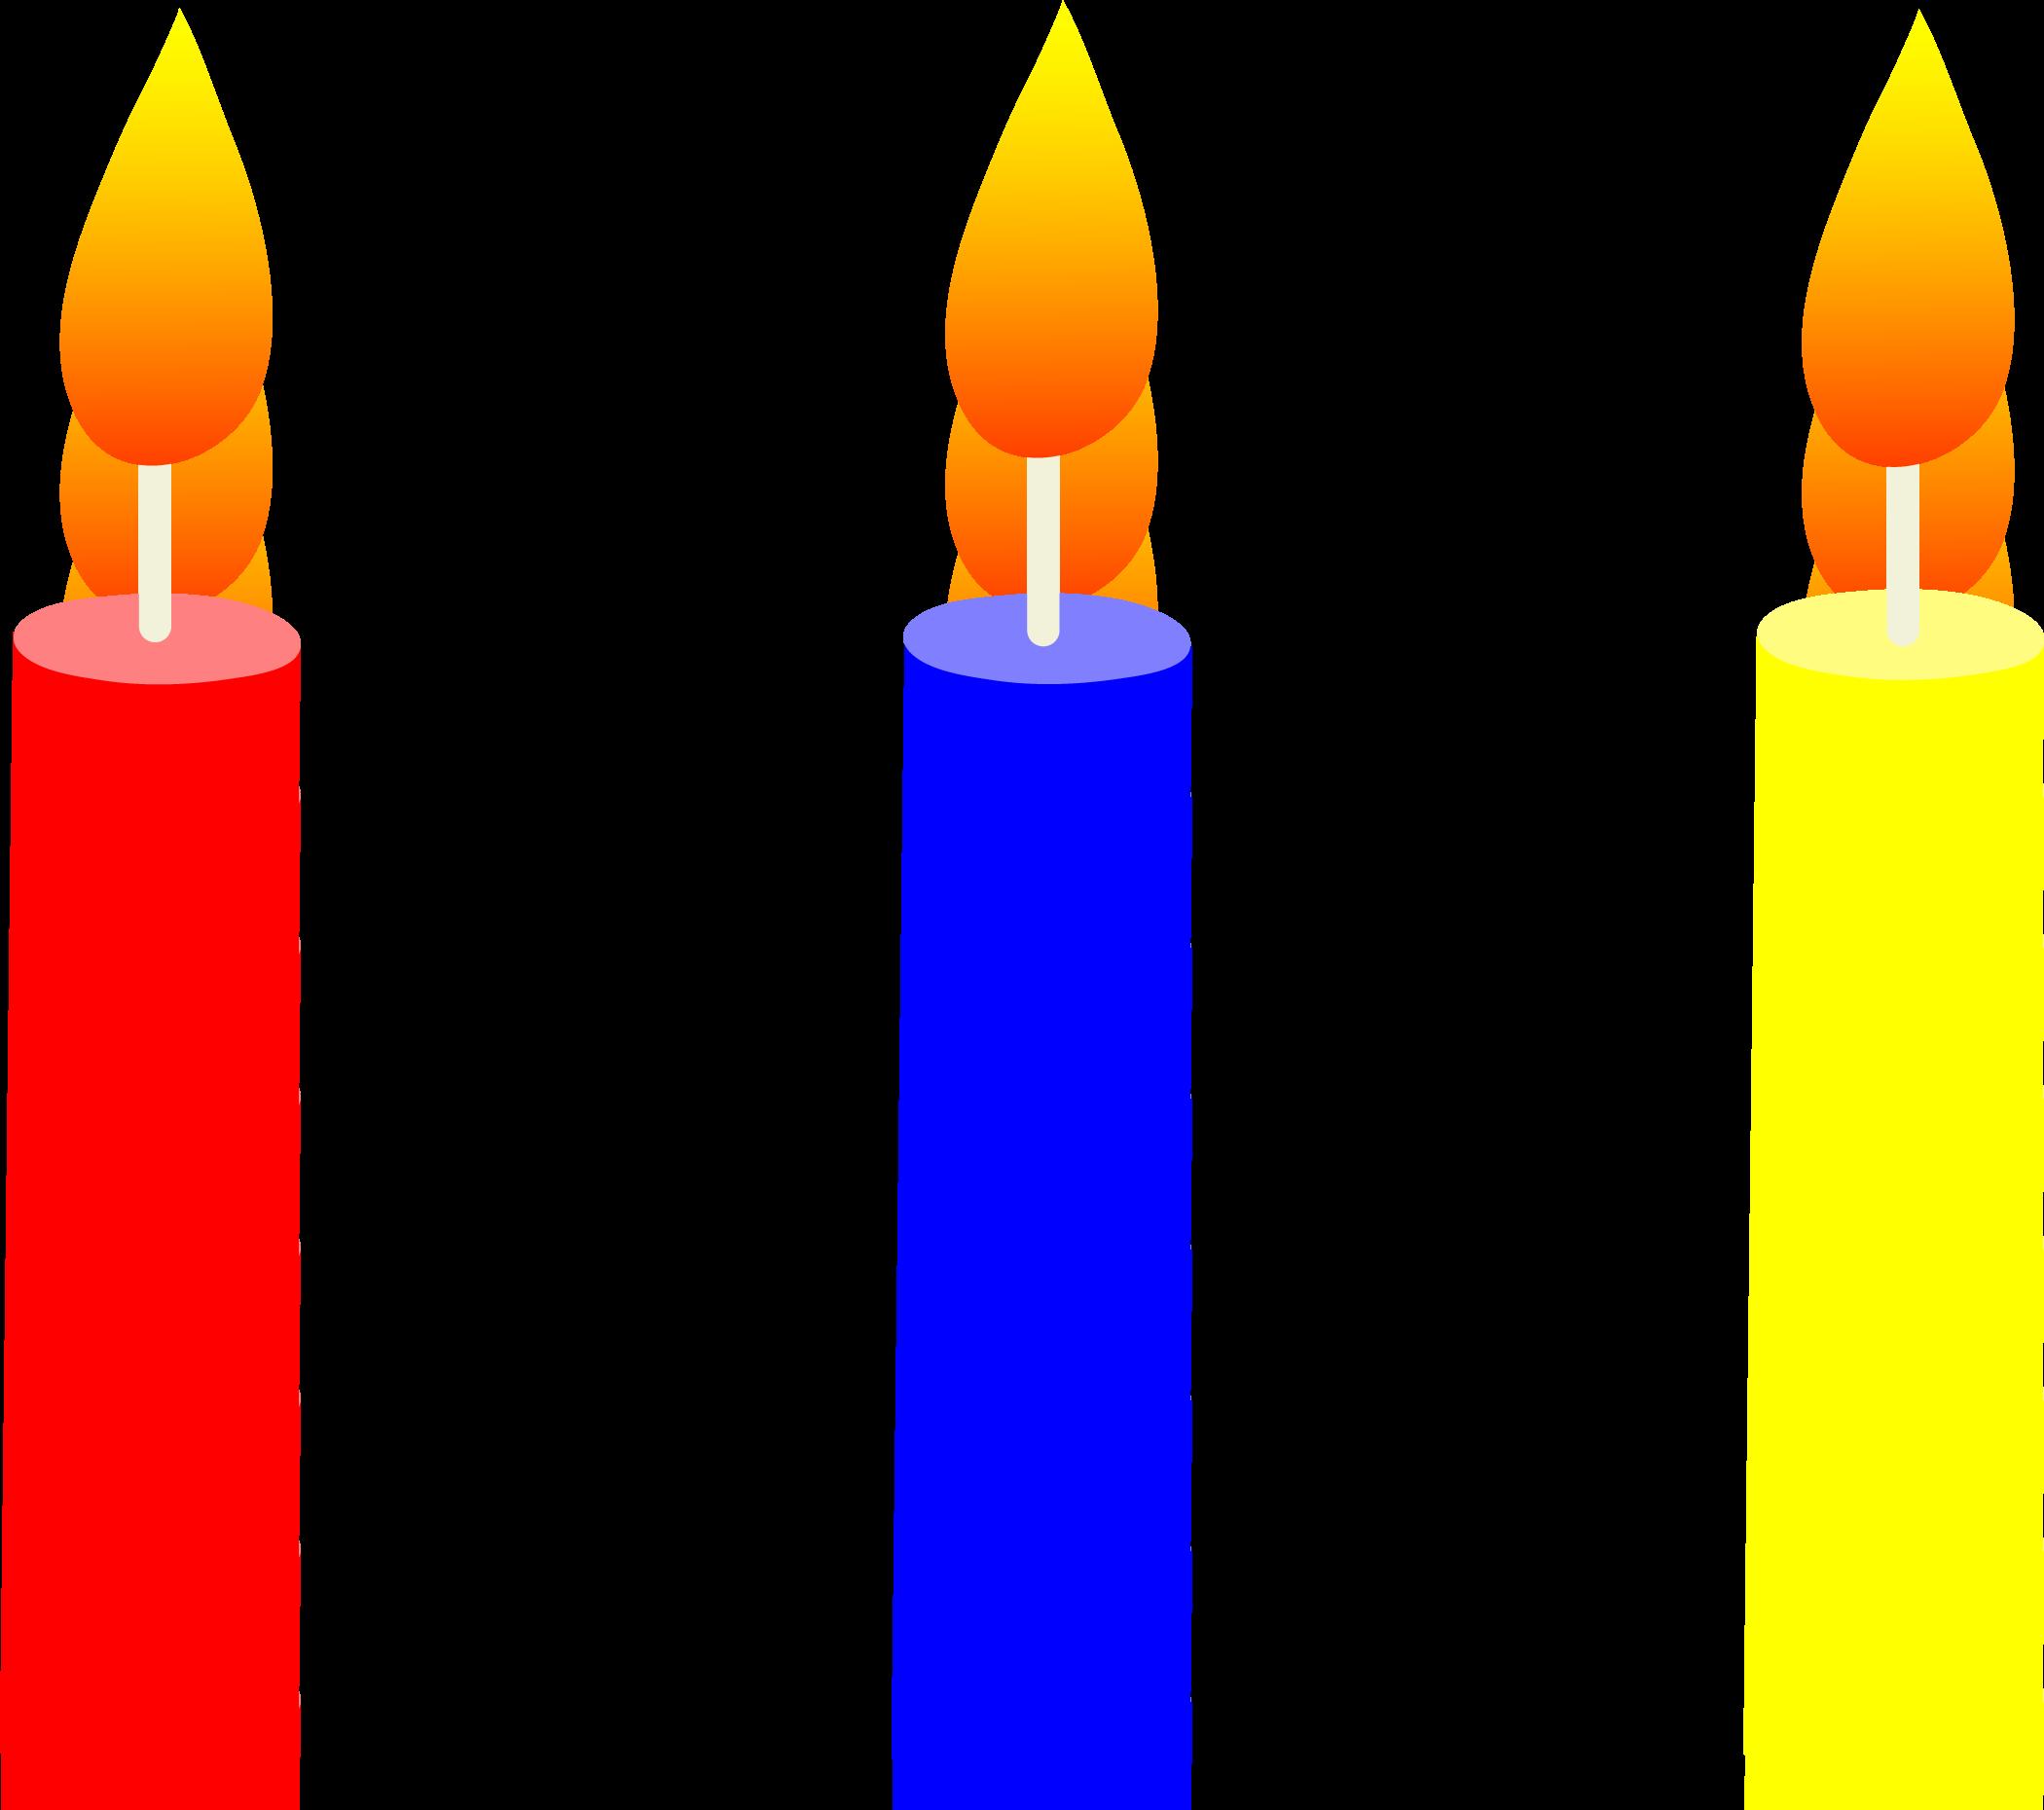 2100x1860 Three Lit Birthday Cake Candles